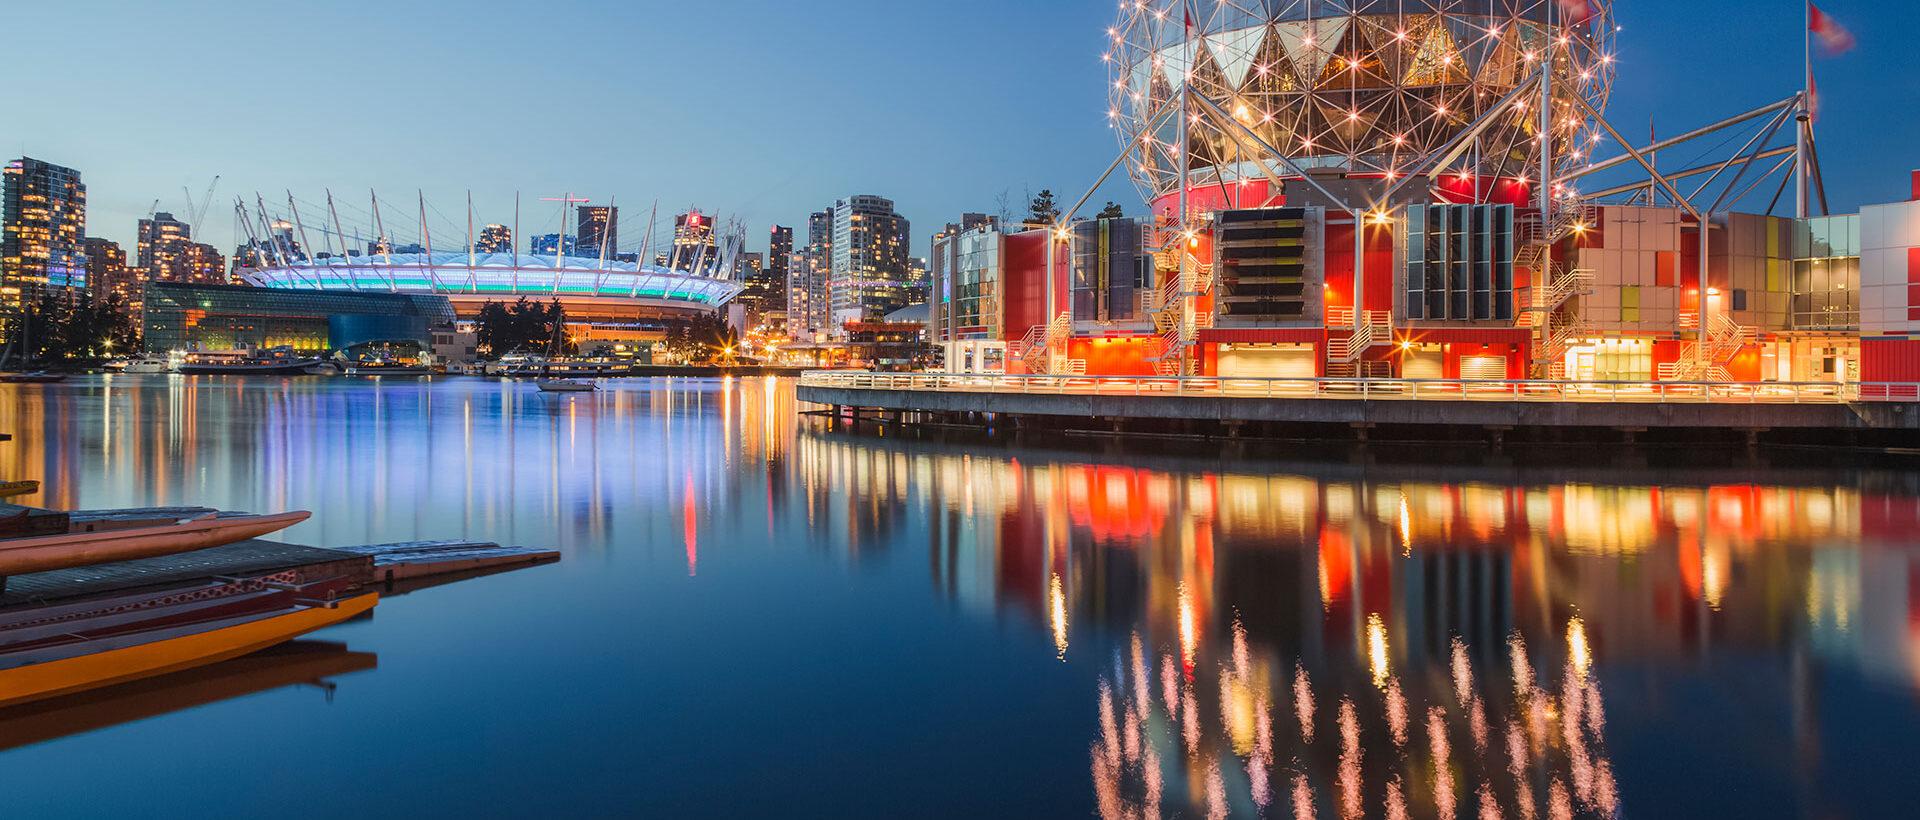 Grupo Summer Camp Agit Vancouver Julho/2022